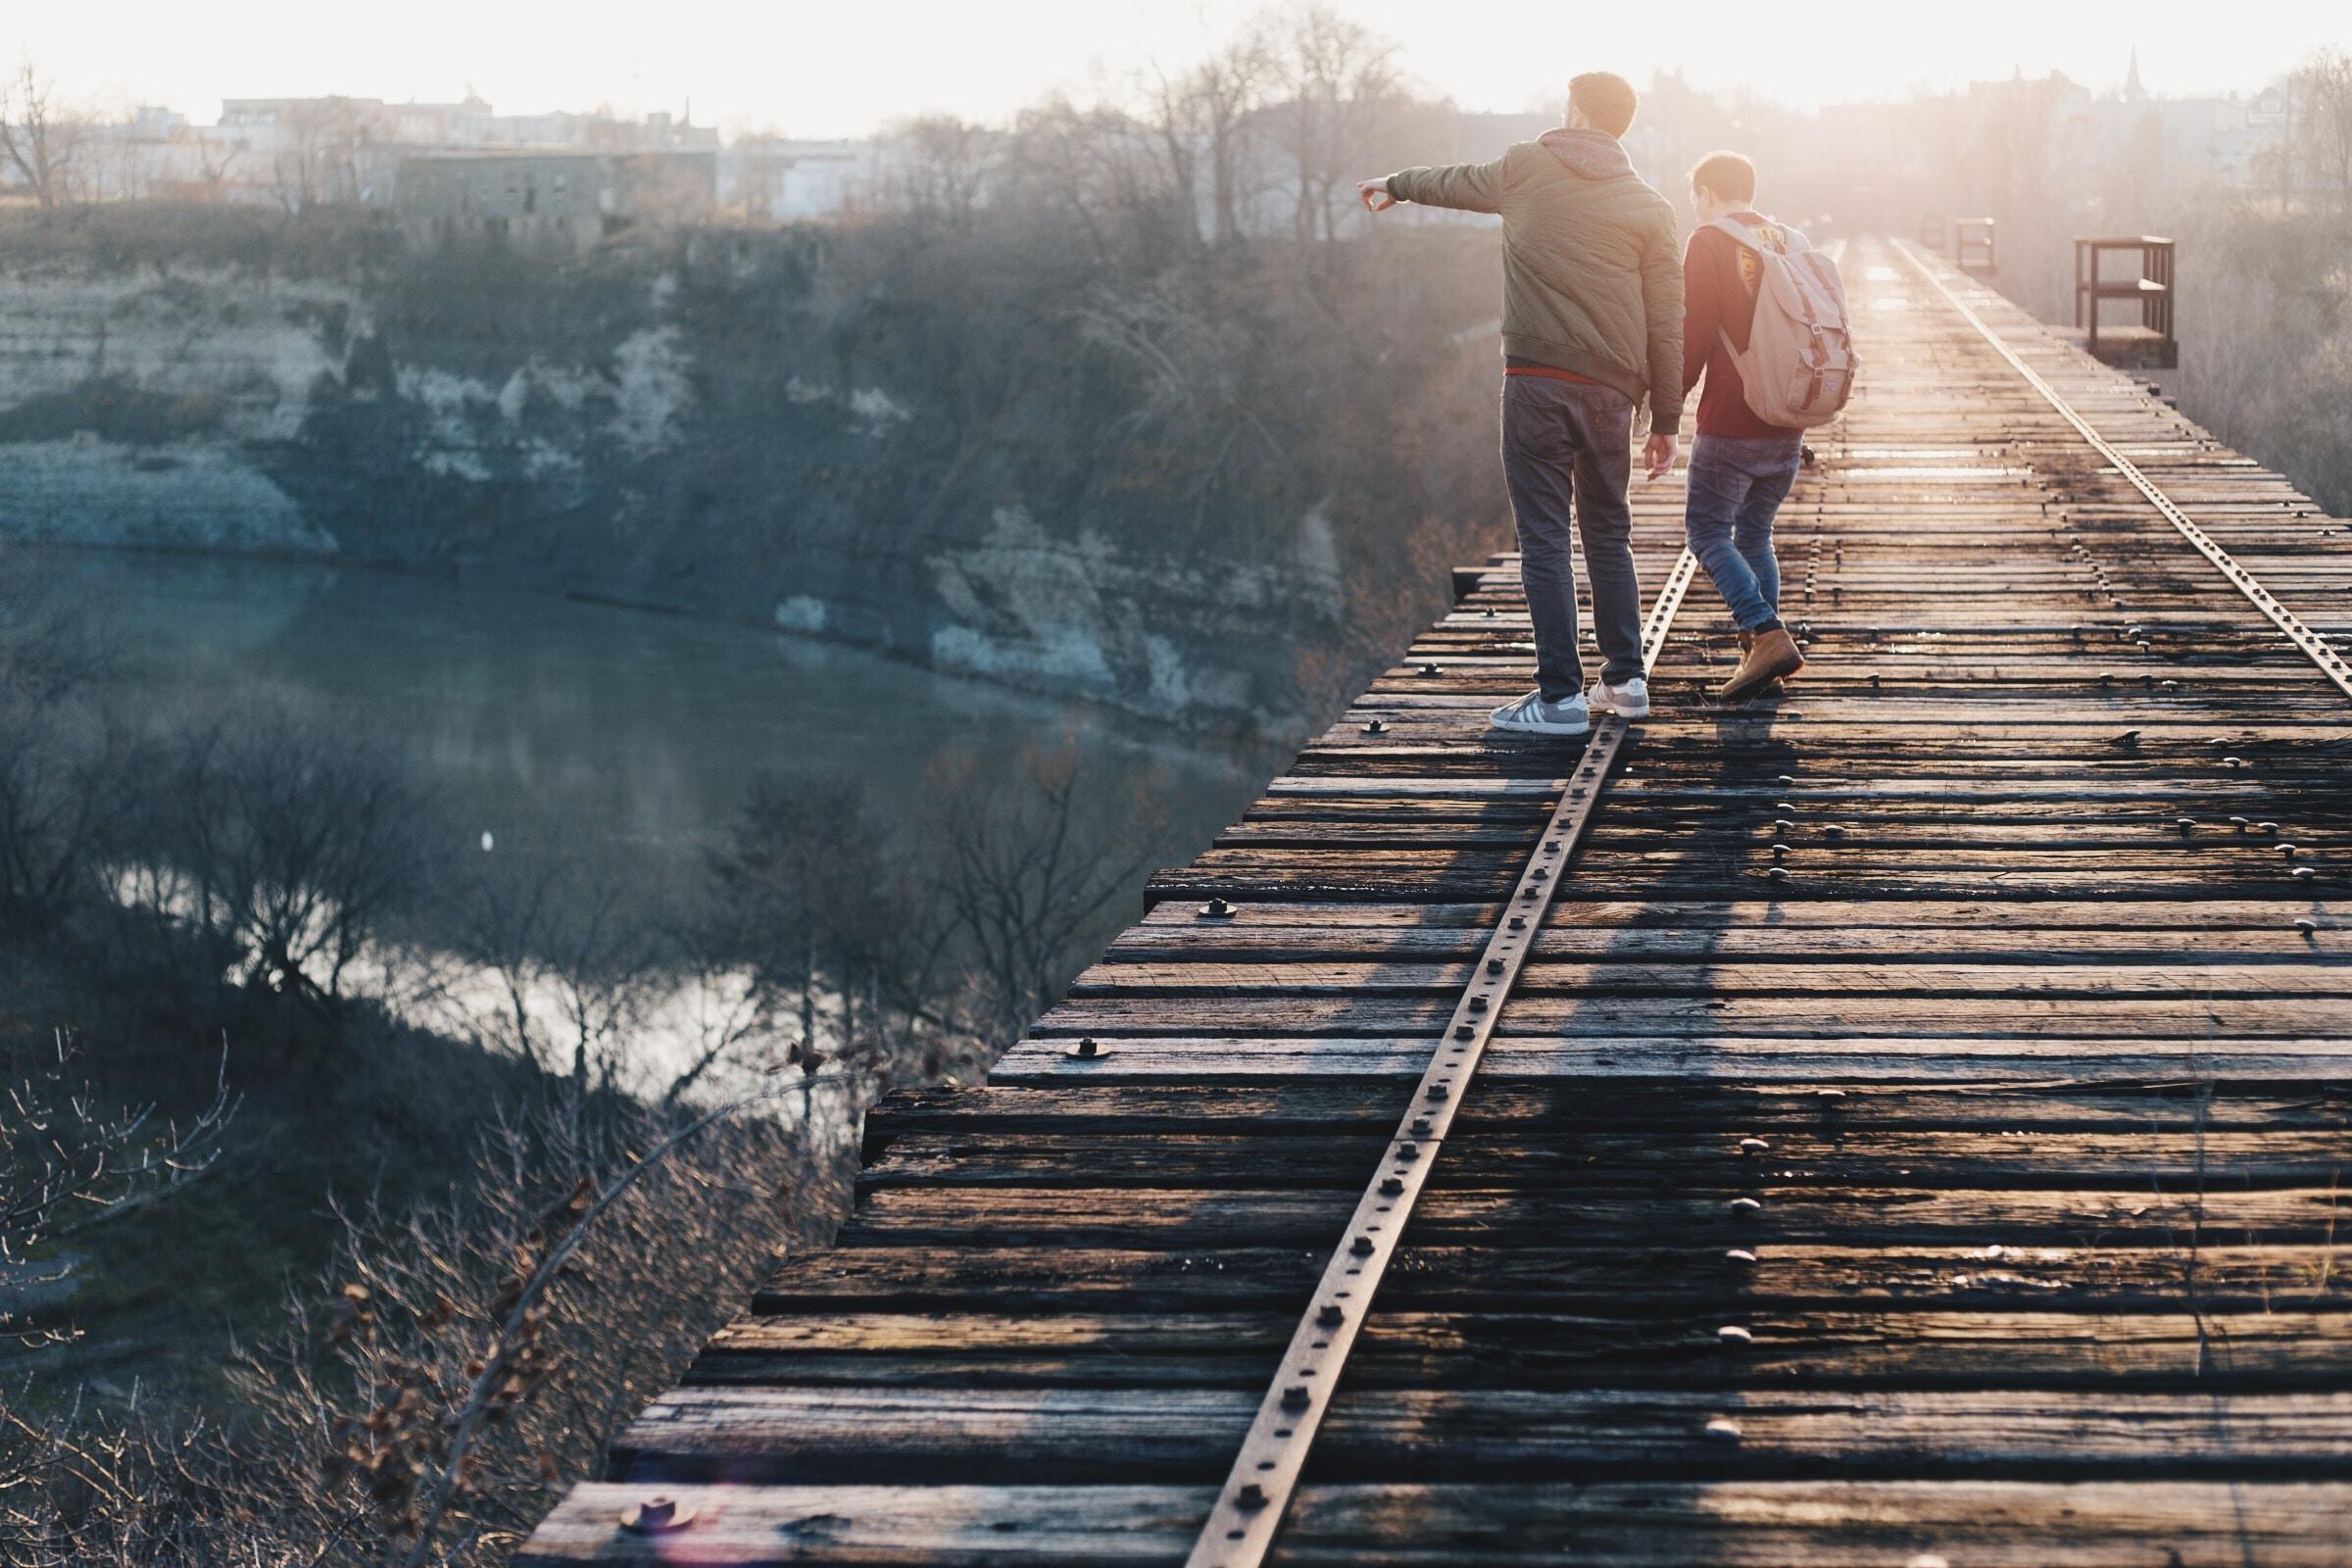 Bridge, lake, railway and hike HD photo by Dan Gribbin (@dangribbin) on Unsplash